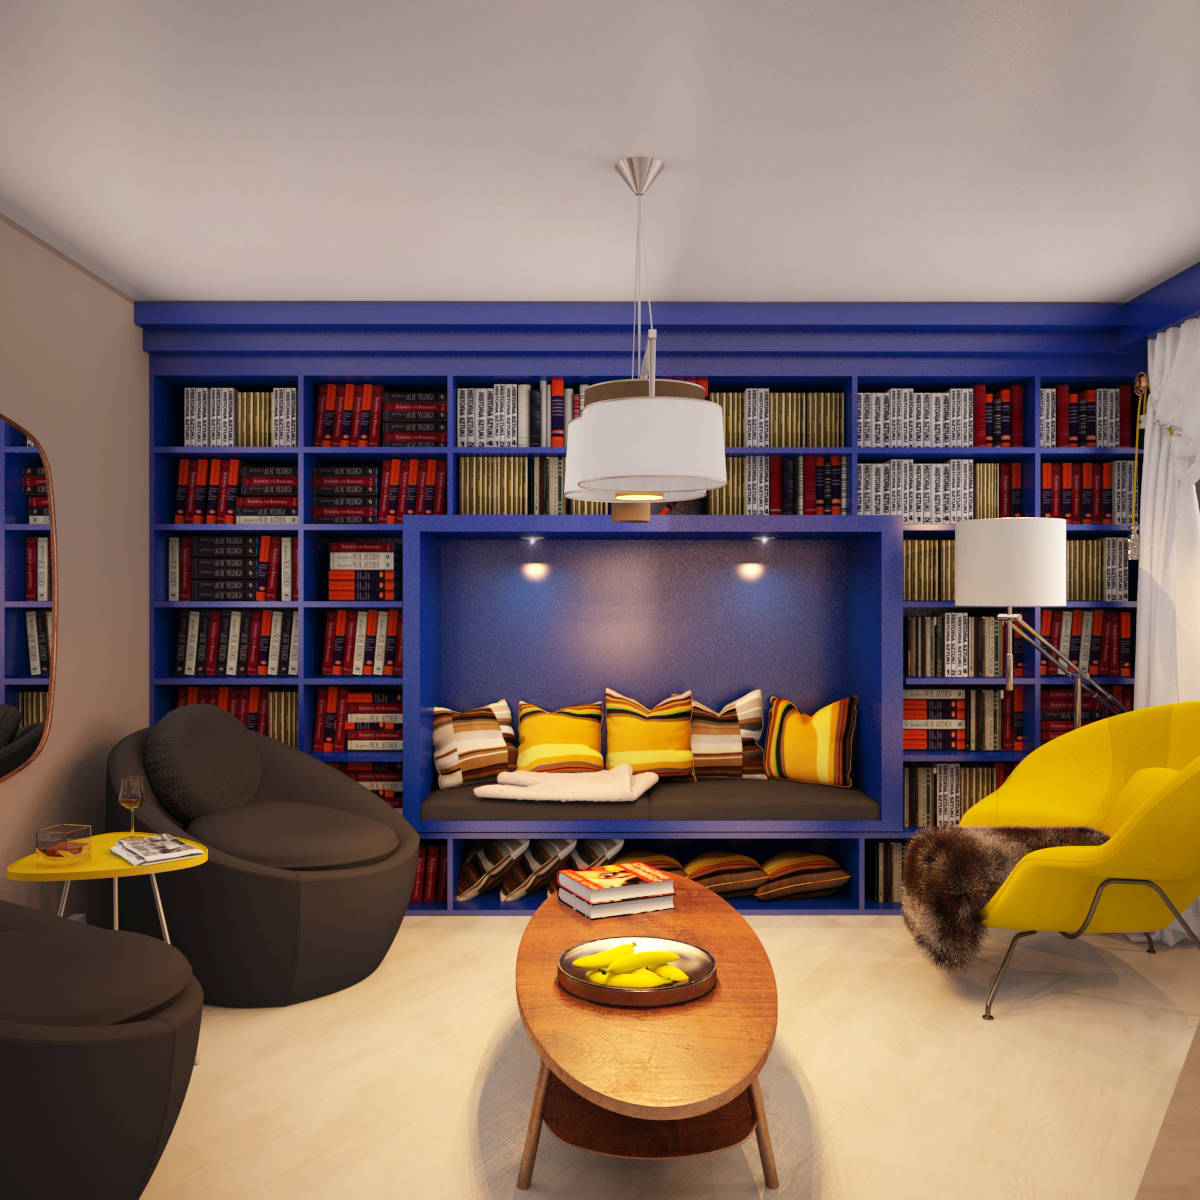 Replane the livingroom